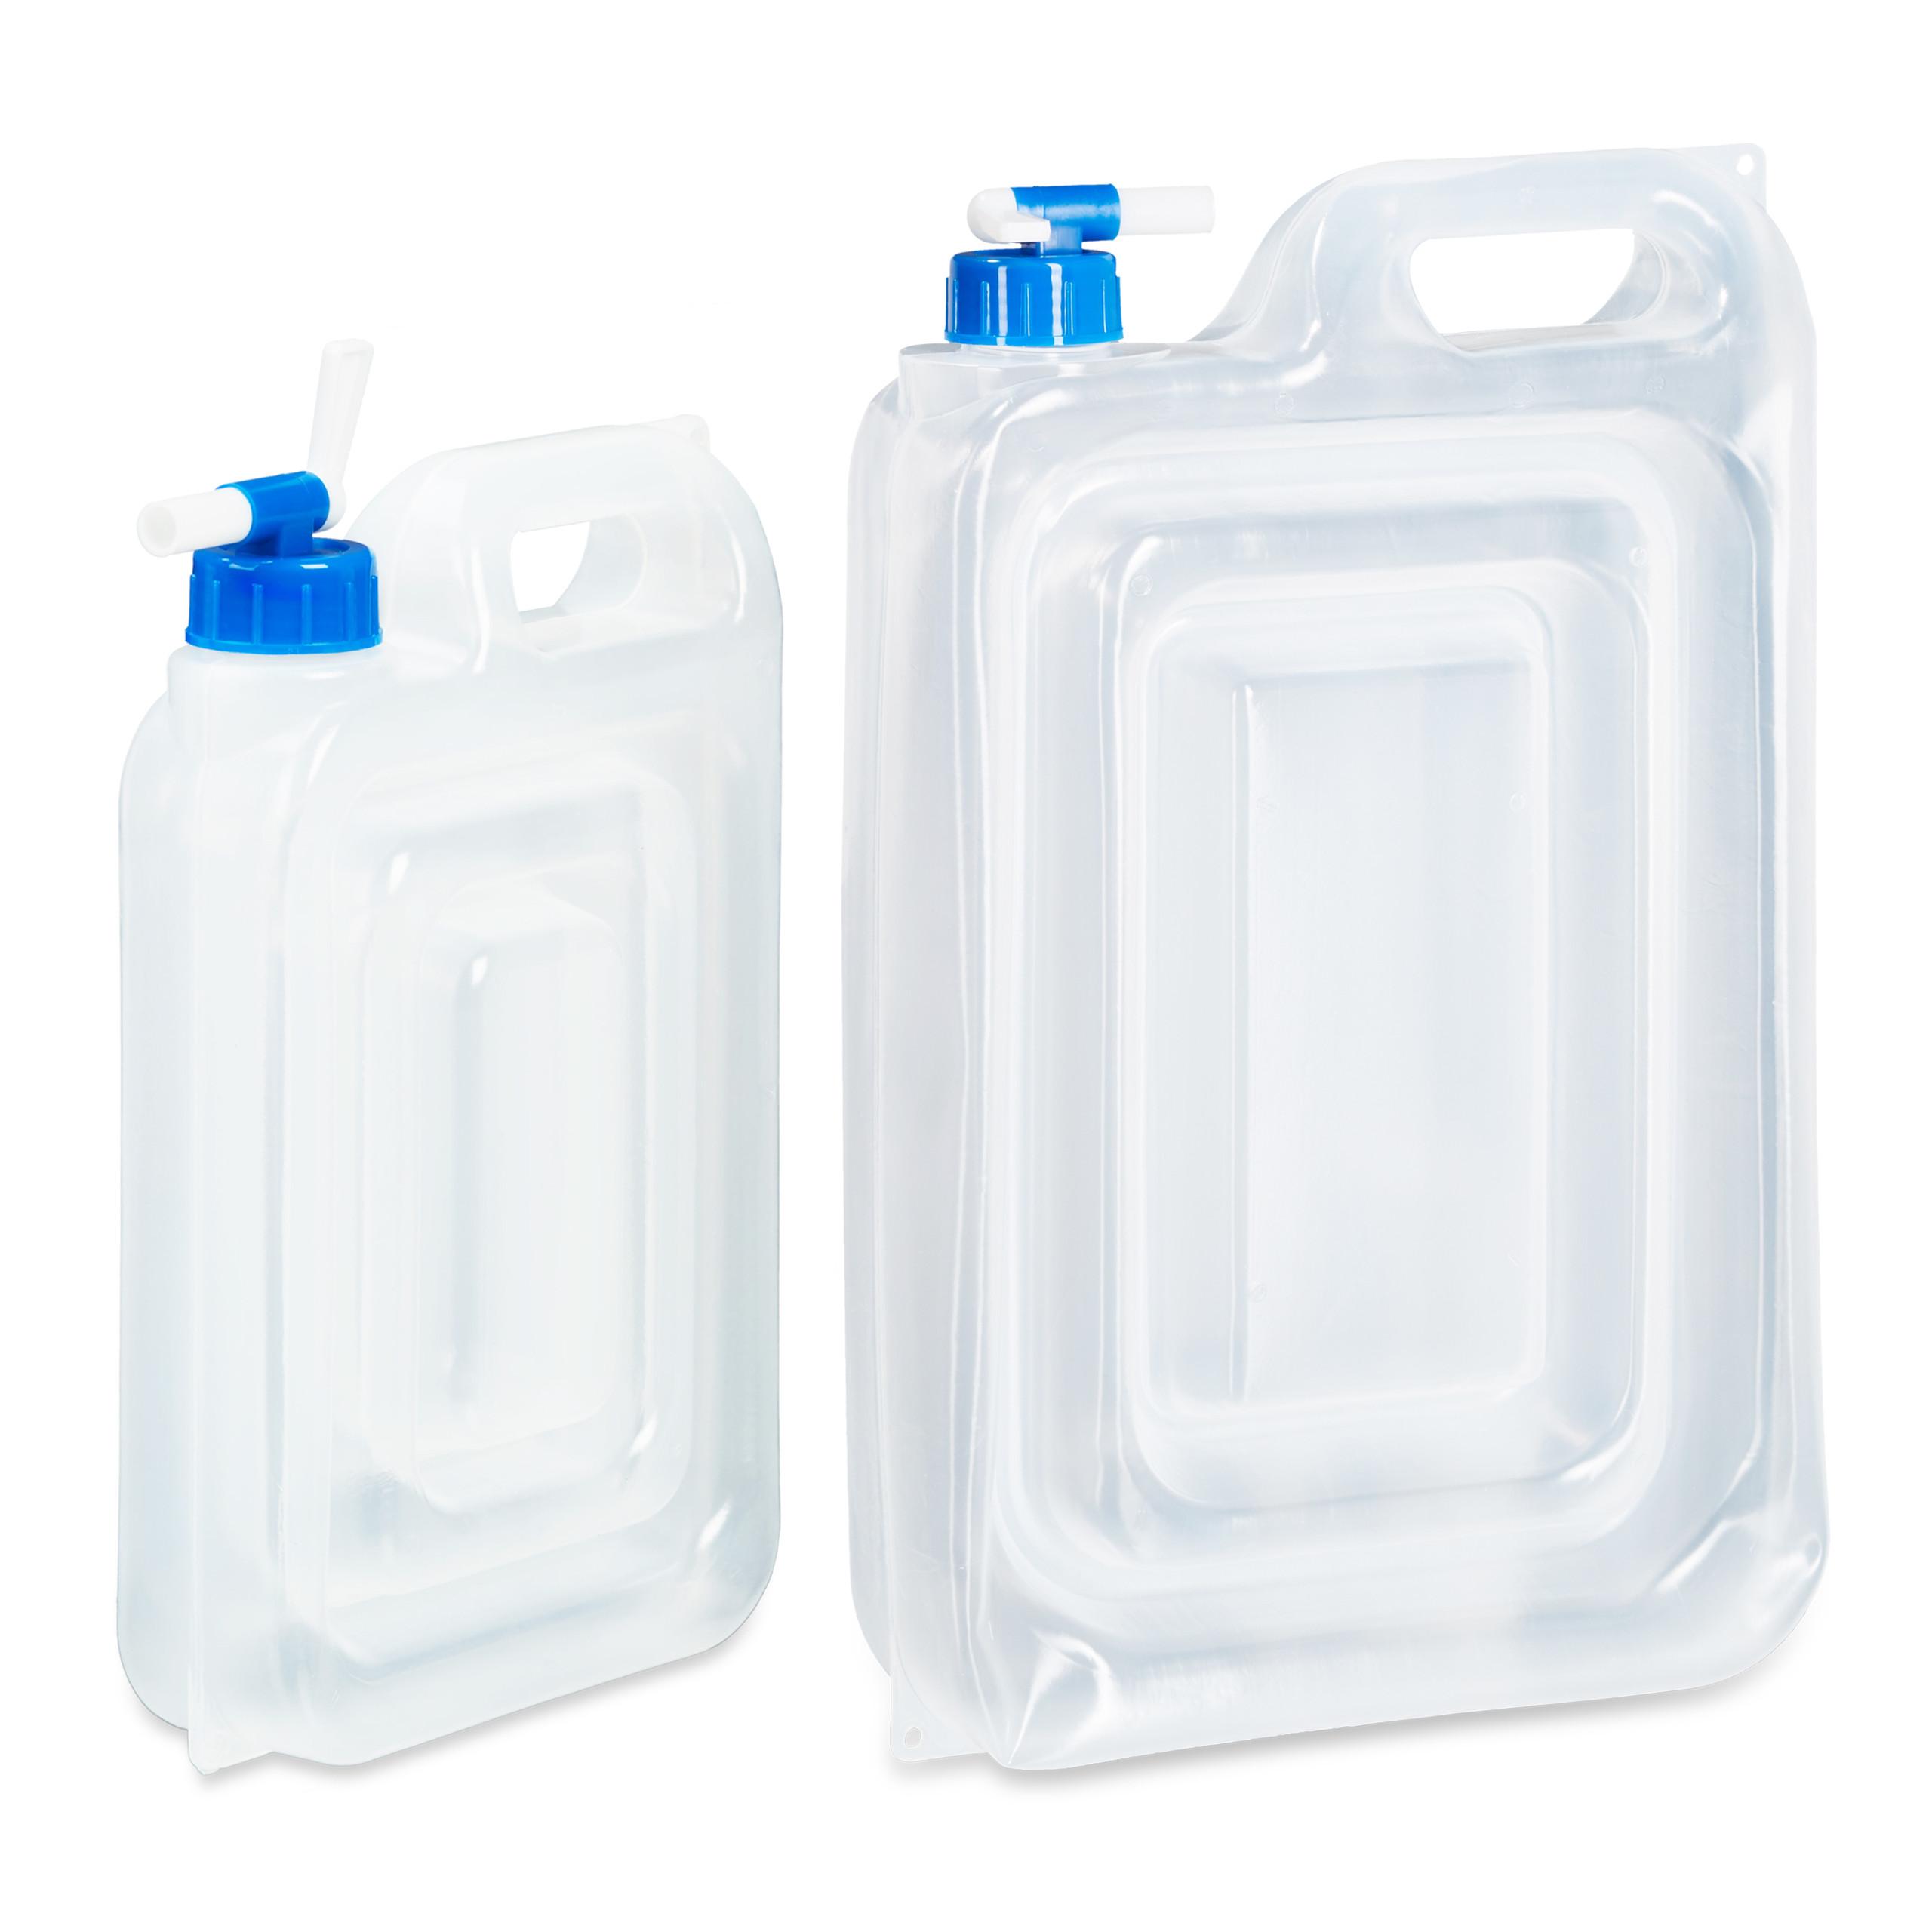 Wasserkanister Camping 4er Set Campingkanister mit Hahn Trinkwasser 15 L, 7,5 L